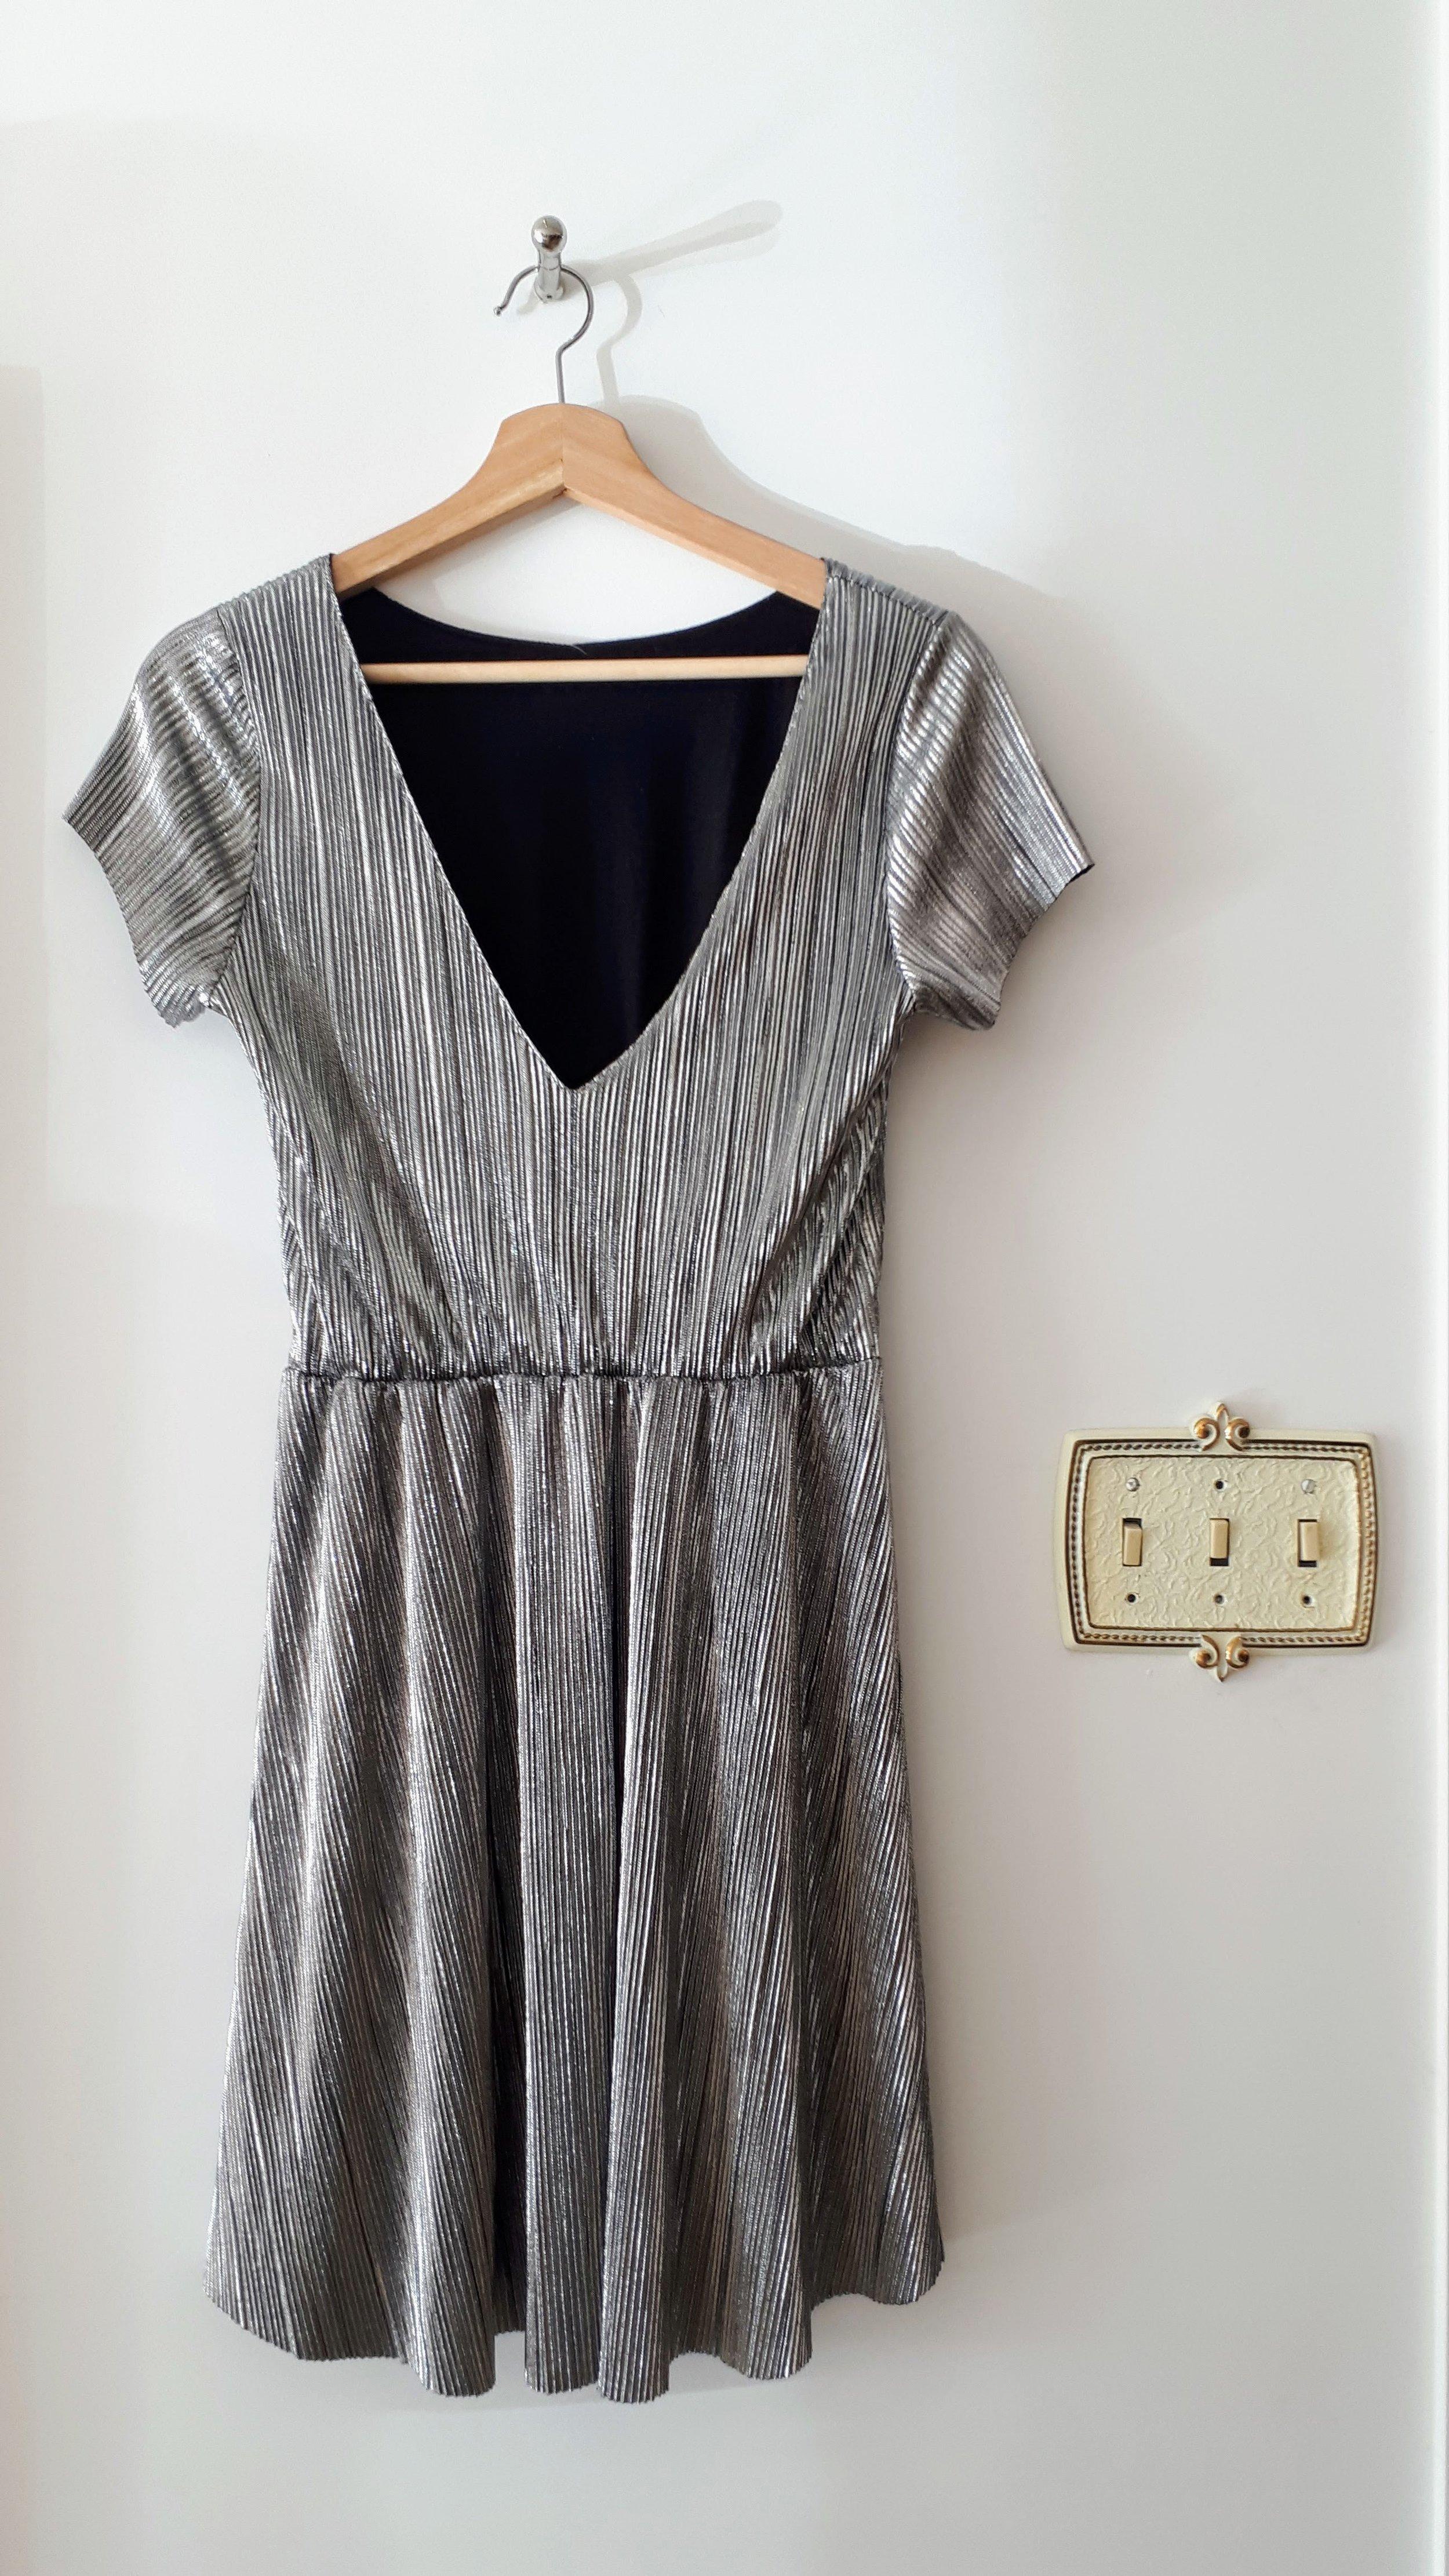 Silver dress; Size S, $26